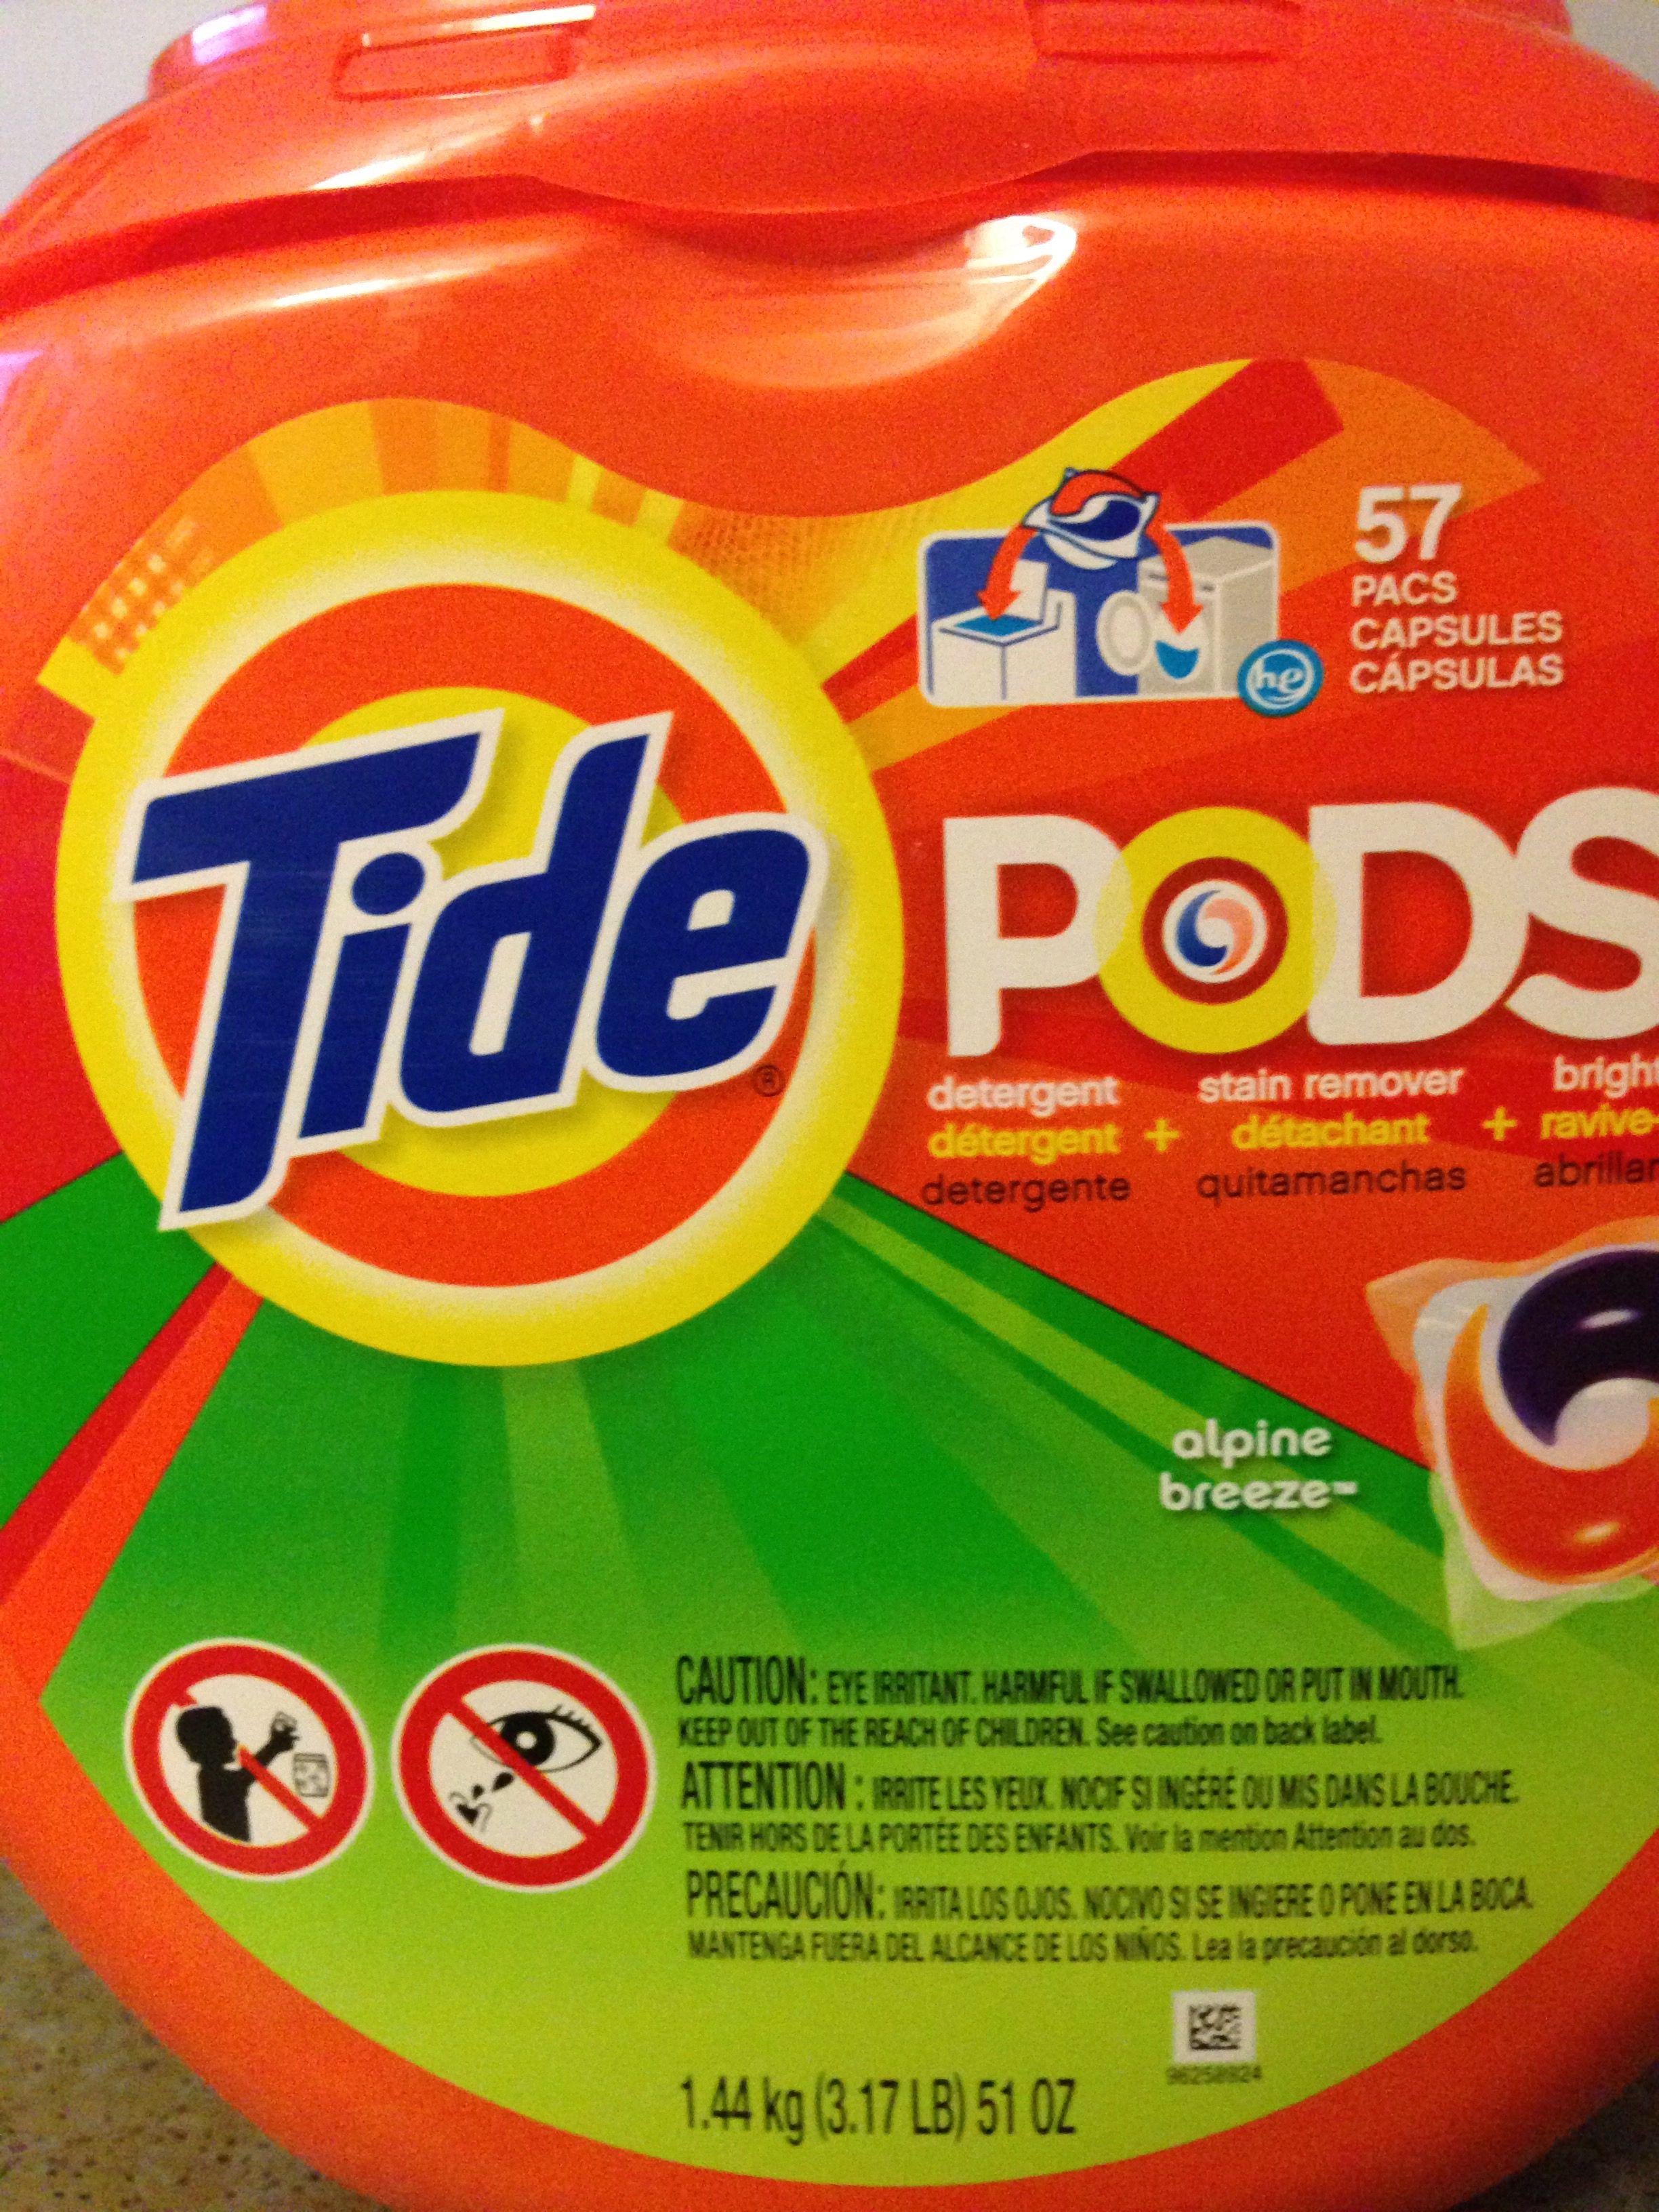 7 99 Tide Pods 57ct At Dillions 8 99 Use 1 00 1 Tide Pods E